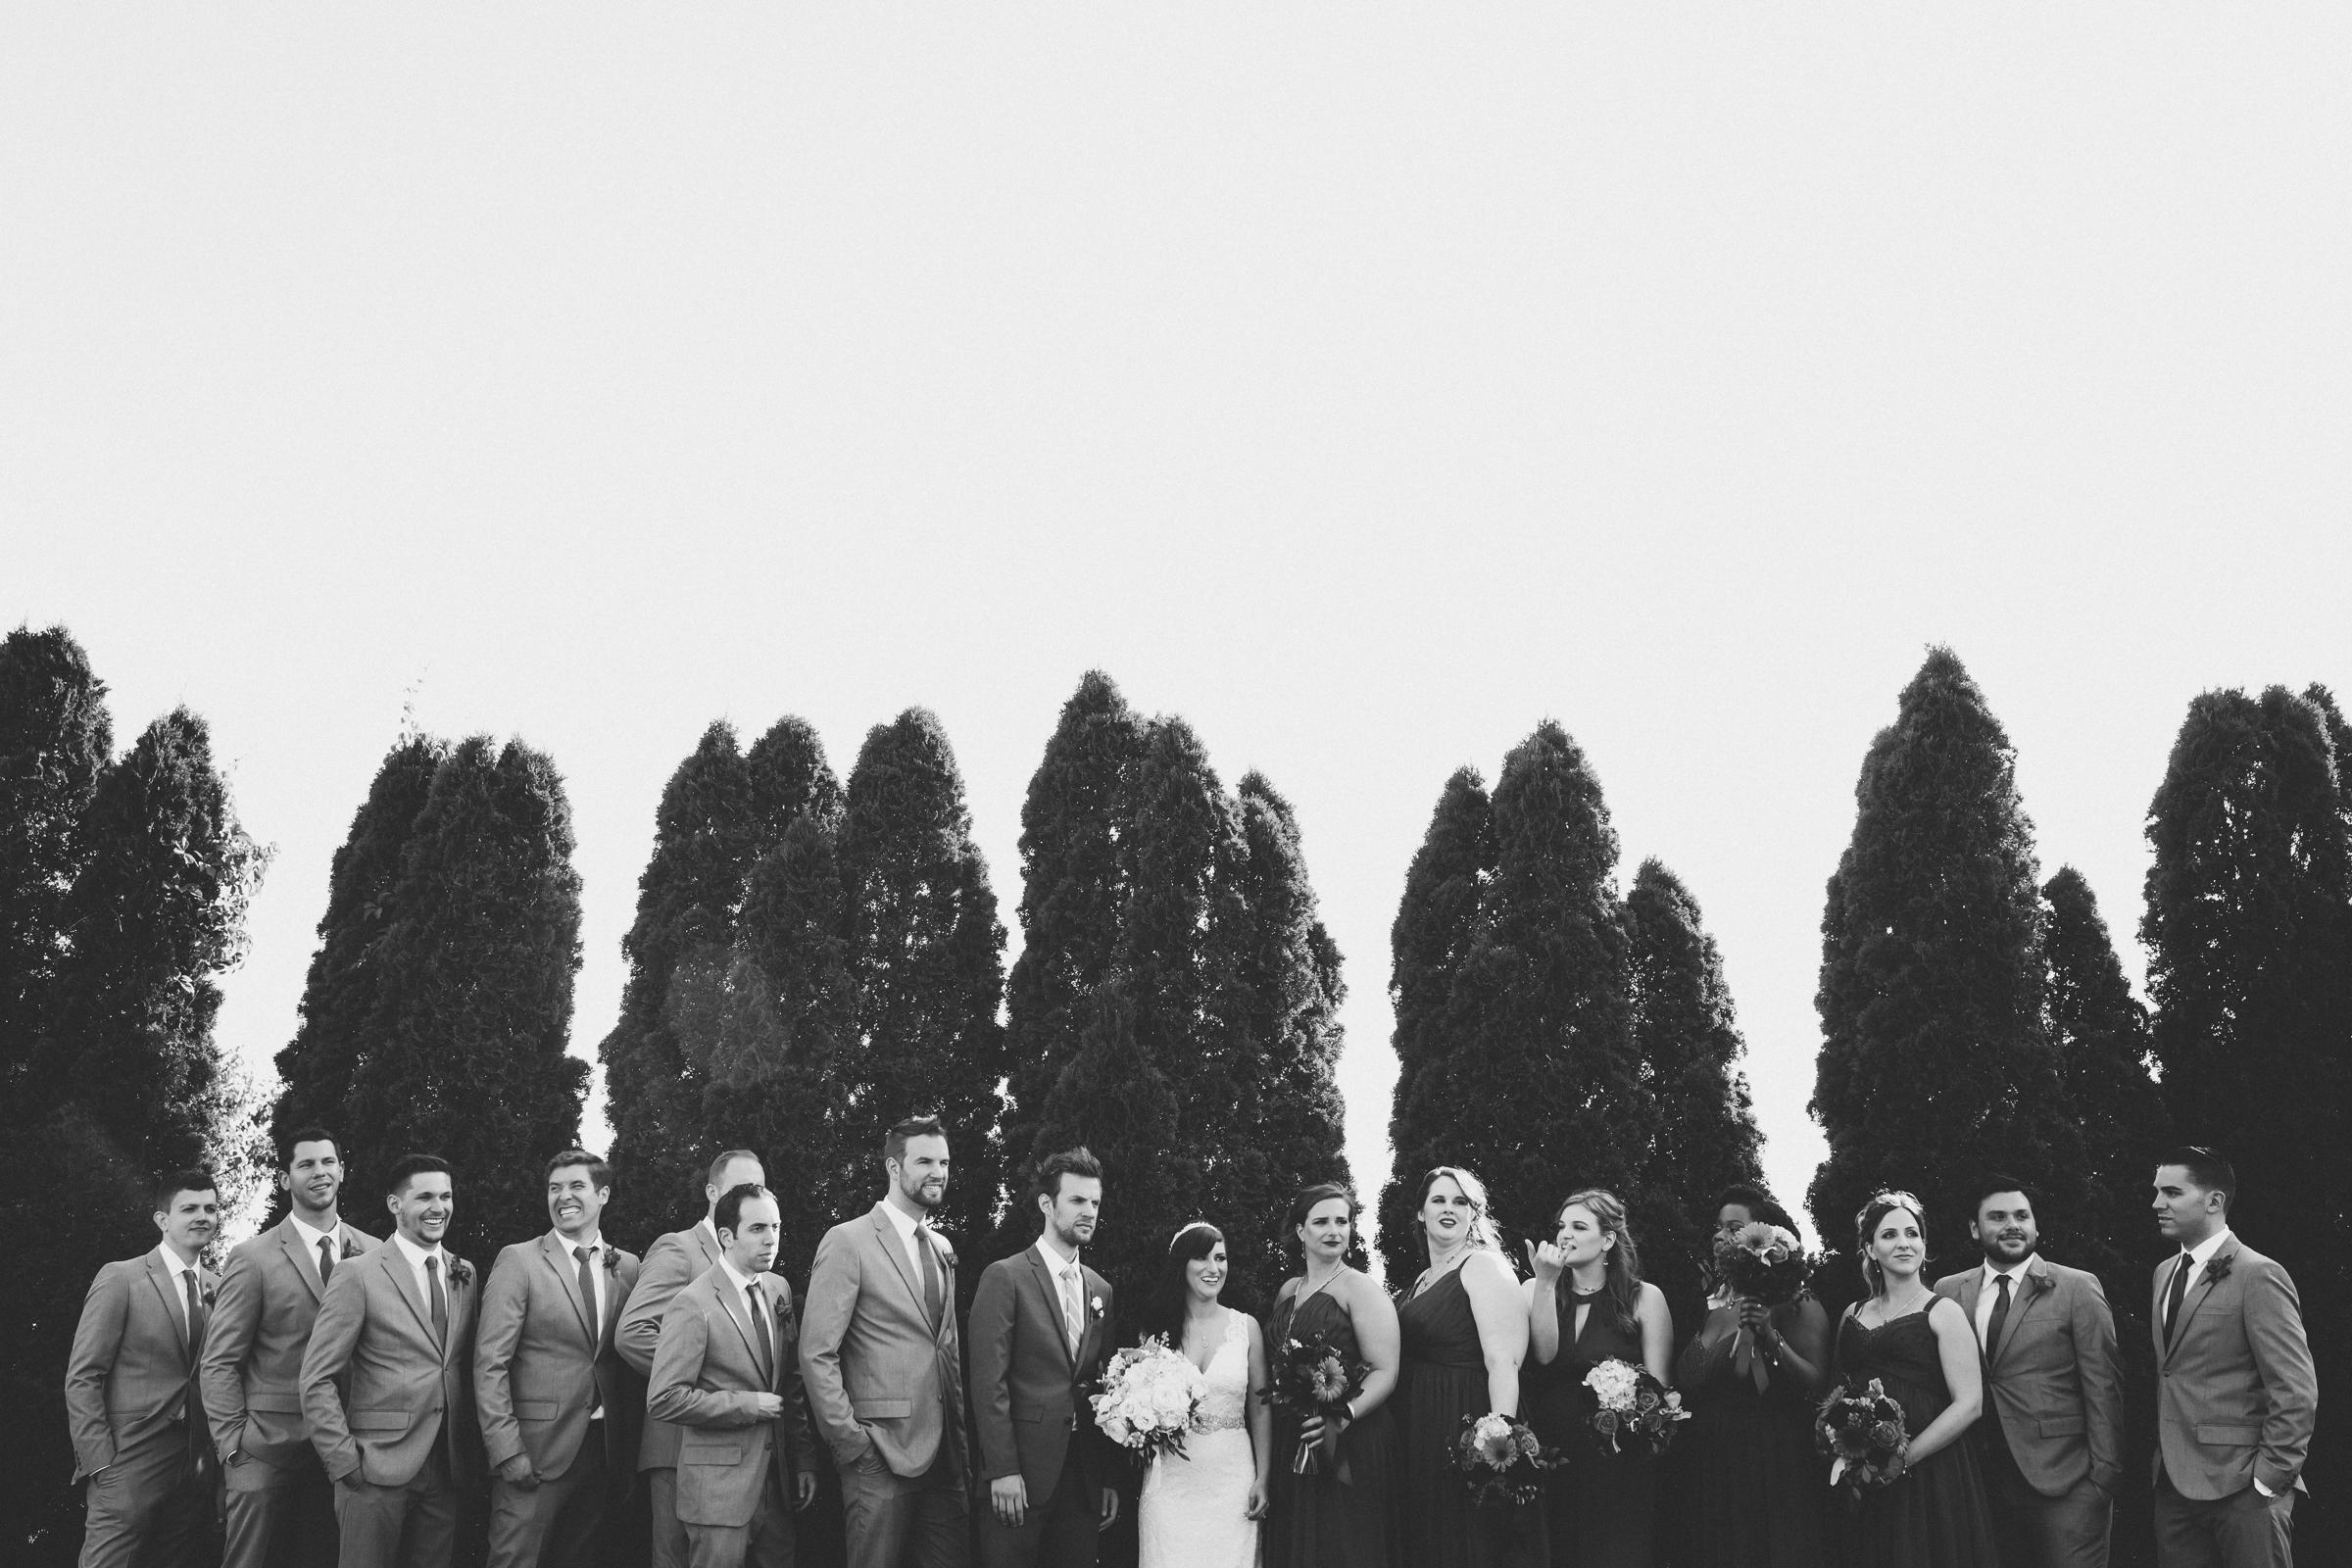 Martha-Clara-Vineyard-Long-Island-Documentary-Wedding-Photographer-39.jpg